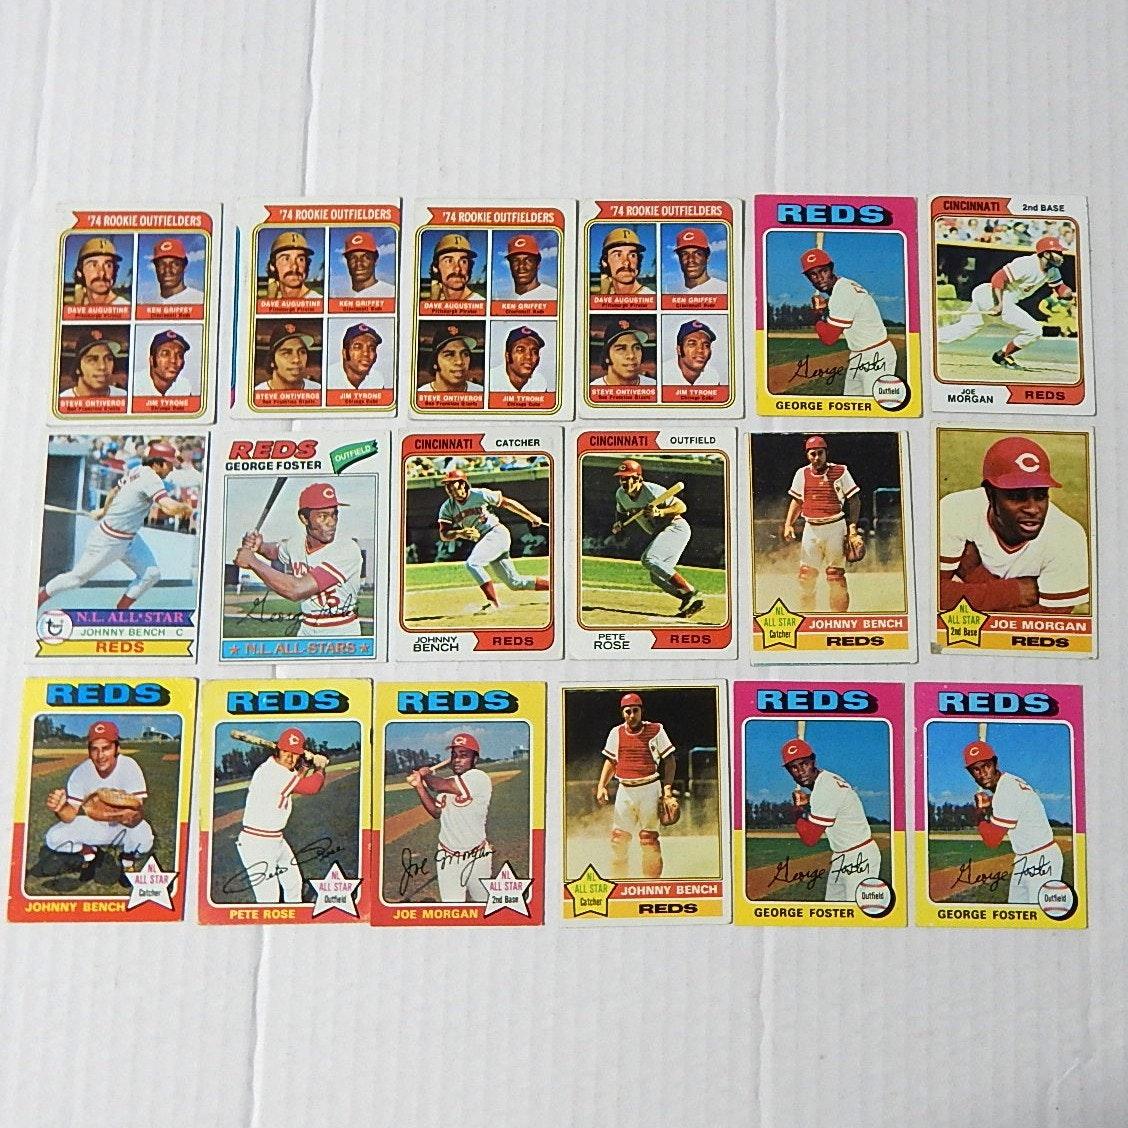 1970s TOPPS Big Red Machine Card Lot